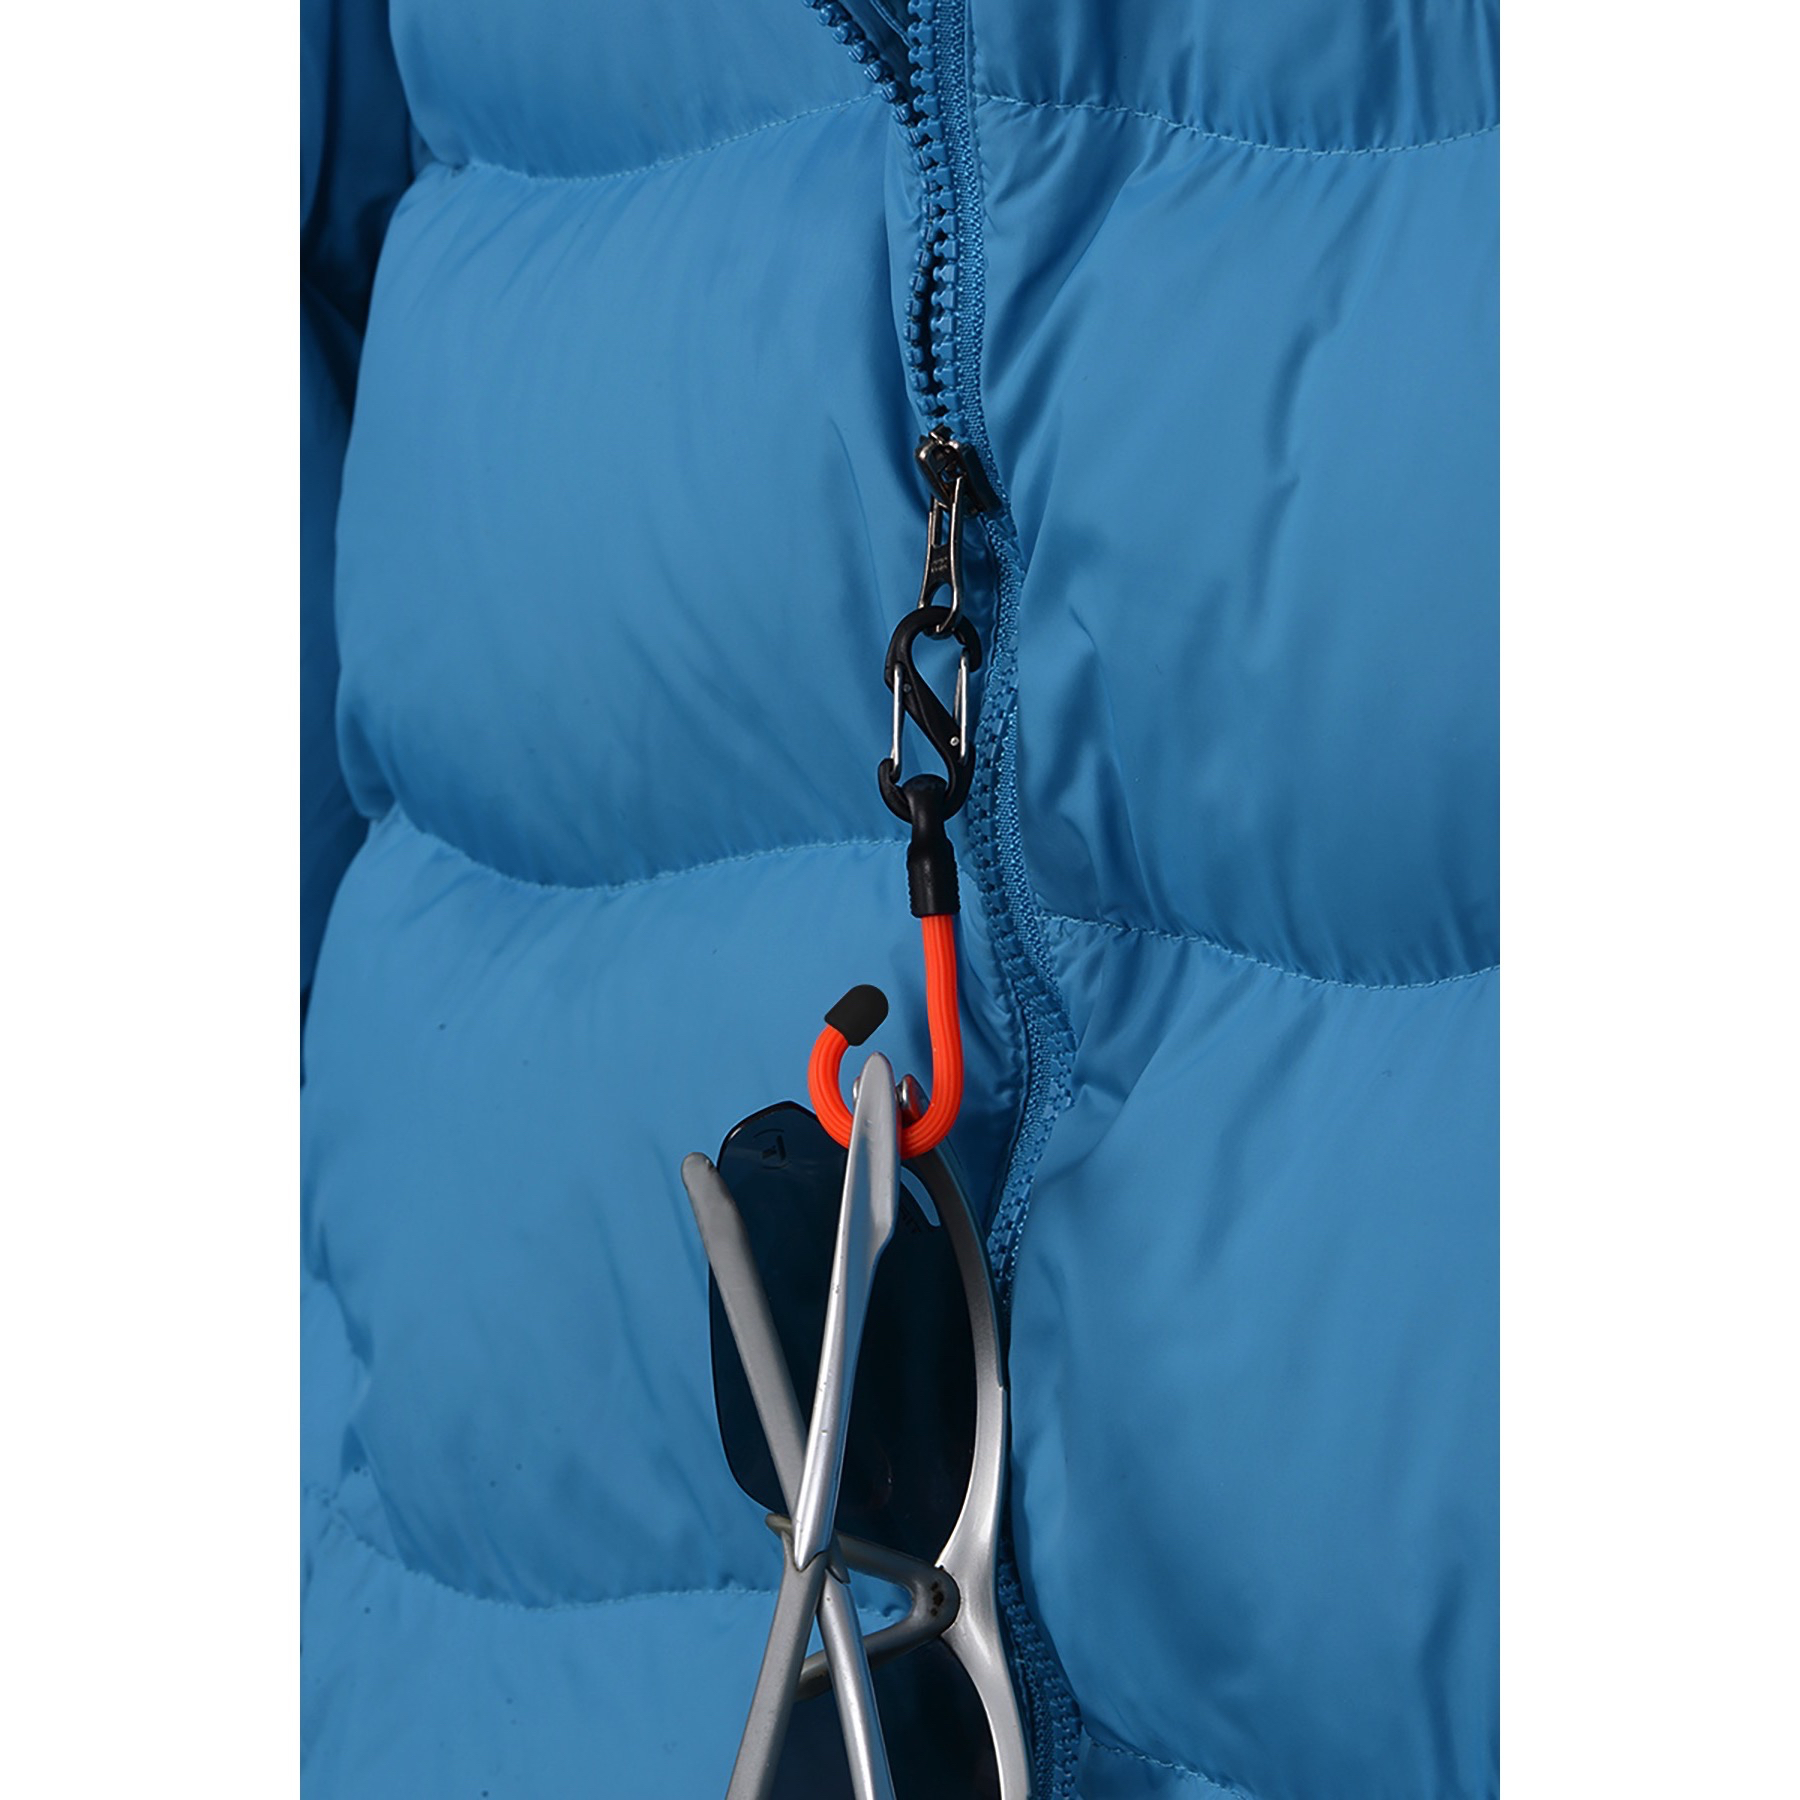 Nite-Ize-Gear-Tie-Clippable-Twist-Tie-3-034-Bright-Orange-w-S-Biners-6-Pack-of-2